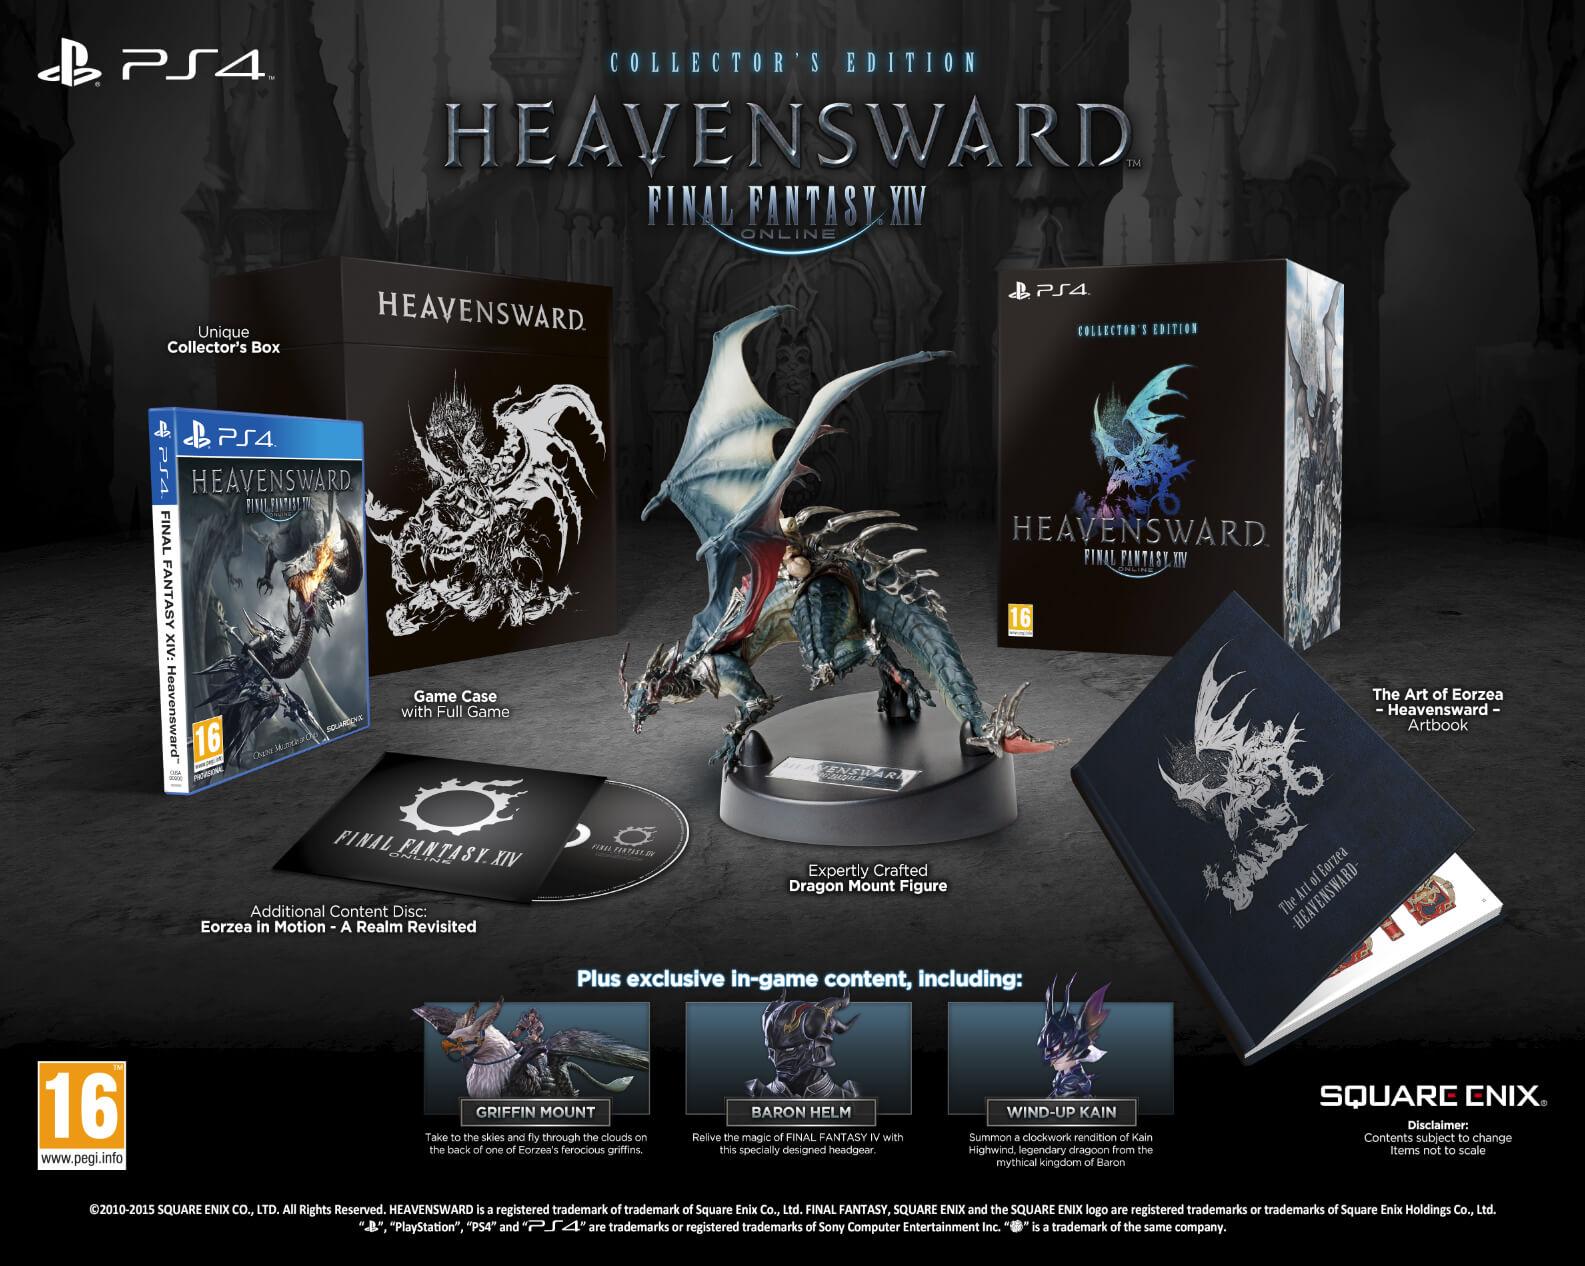 FFXIV Heavensward Collectors Edition And More